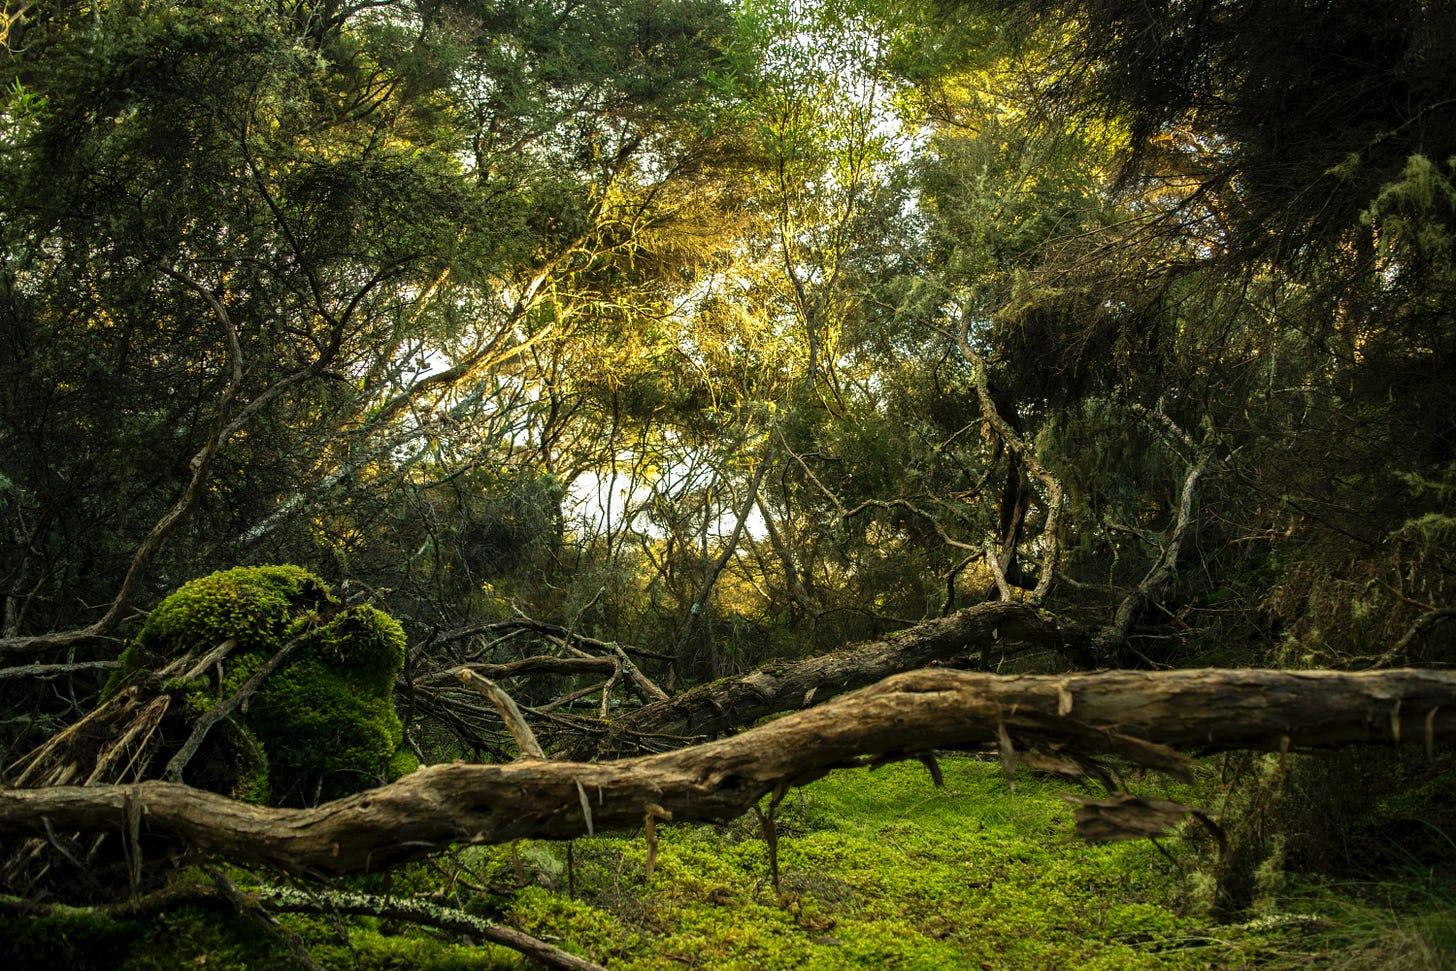 A photo of a dense jungle